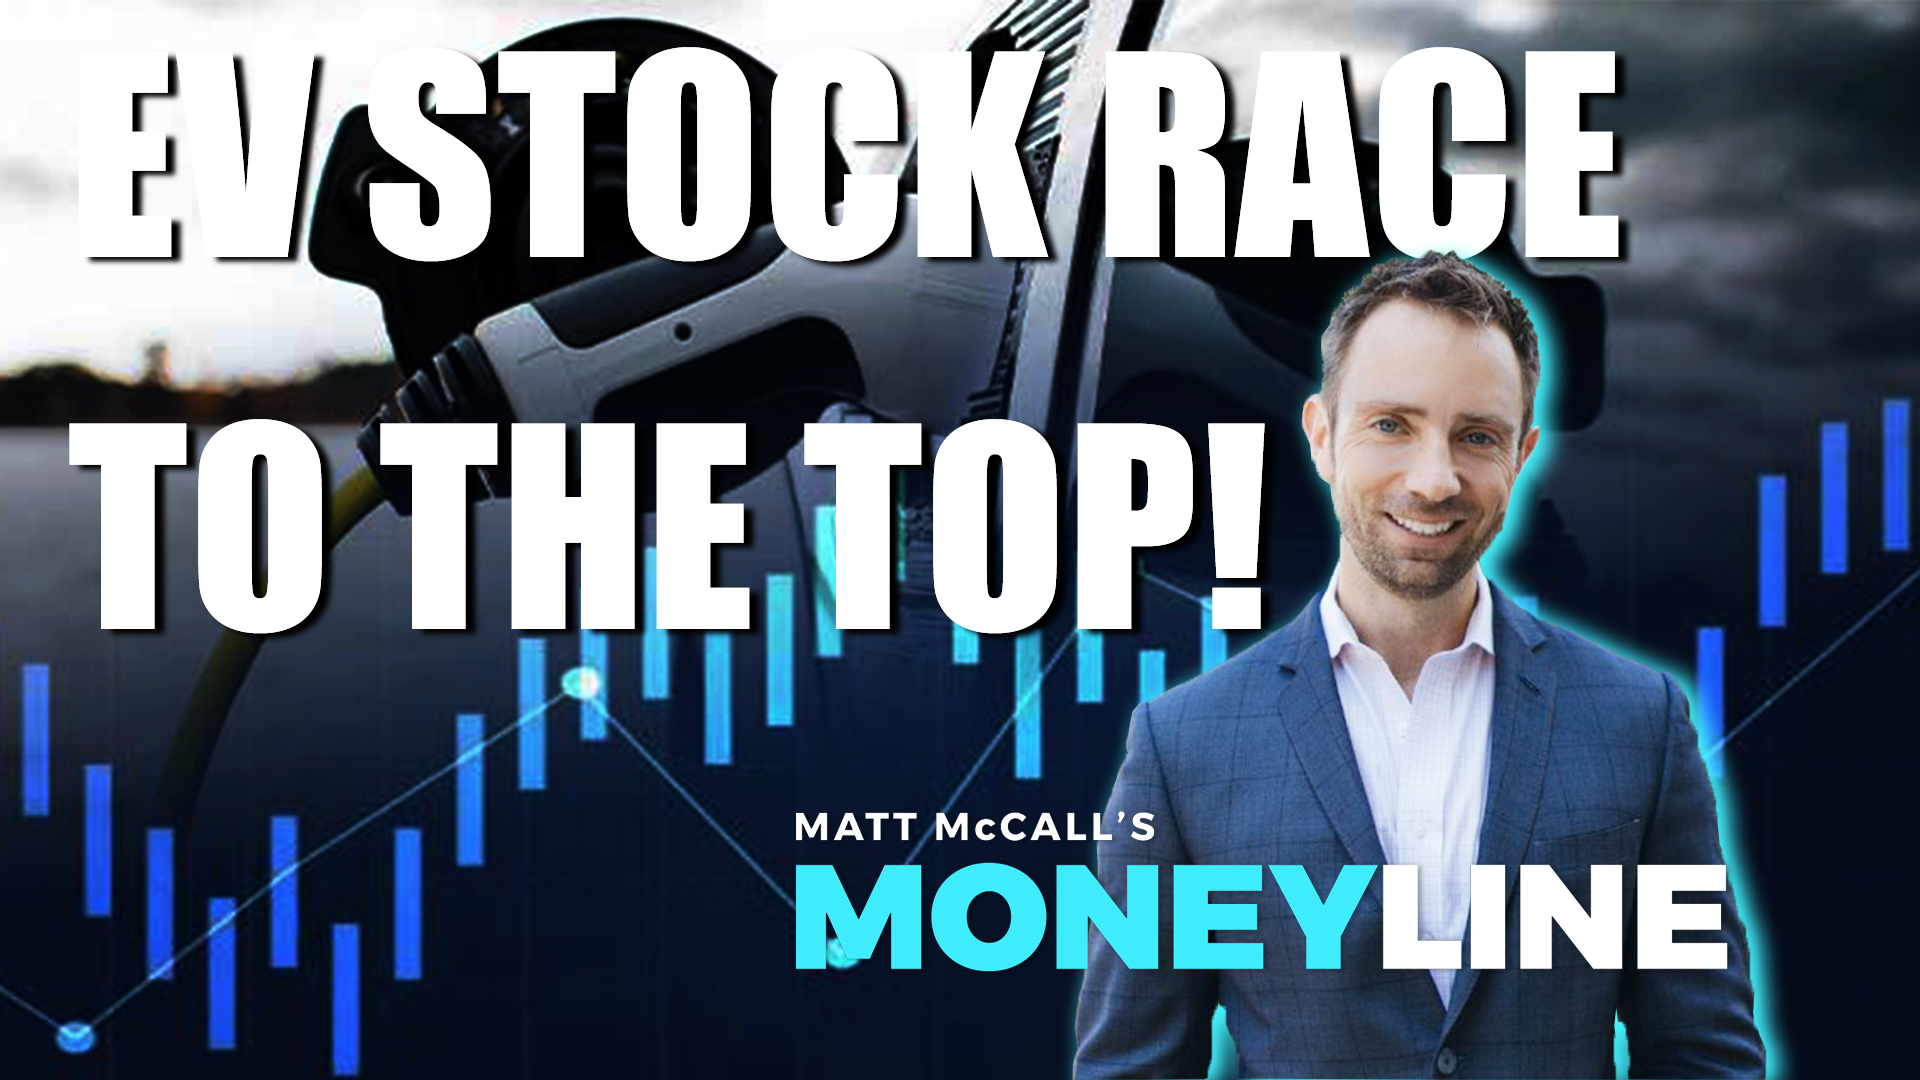 Matt McCall's Moneyline: EV Stock Race to the Top!